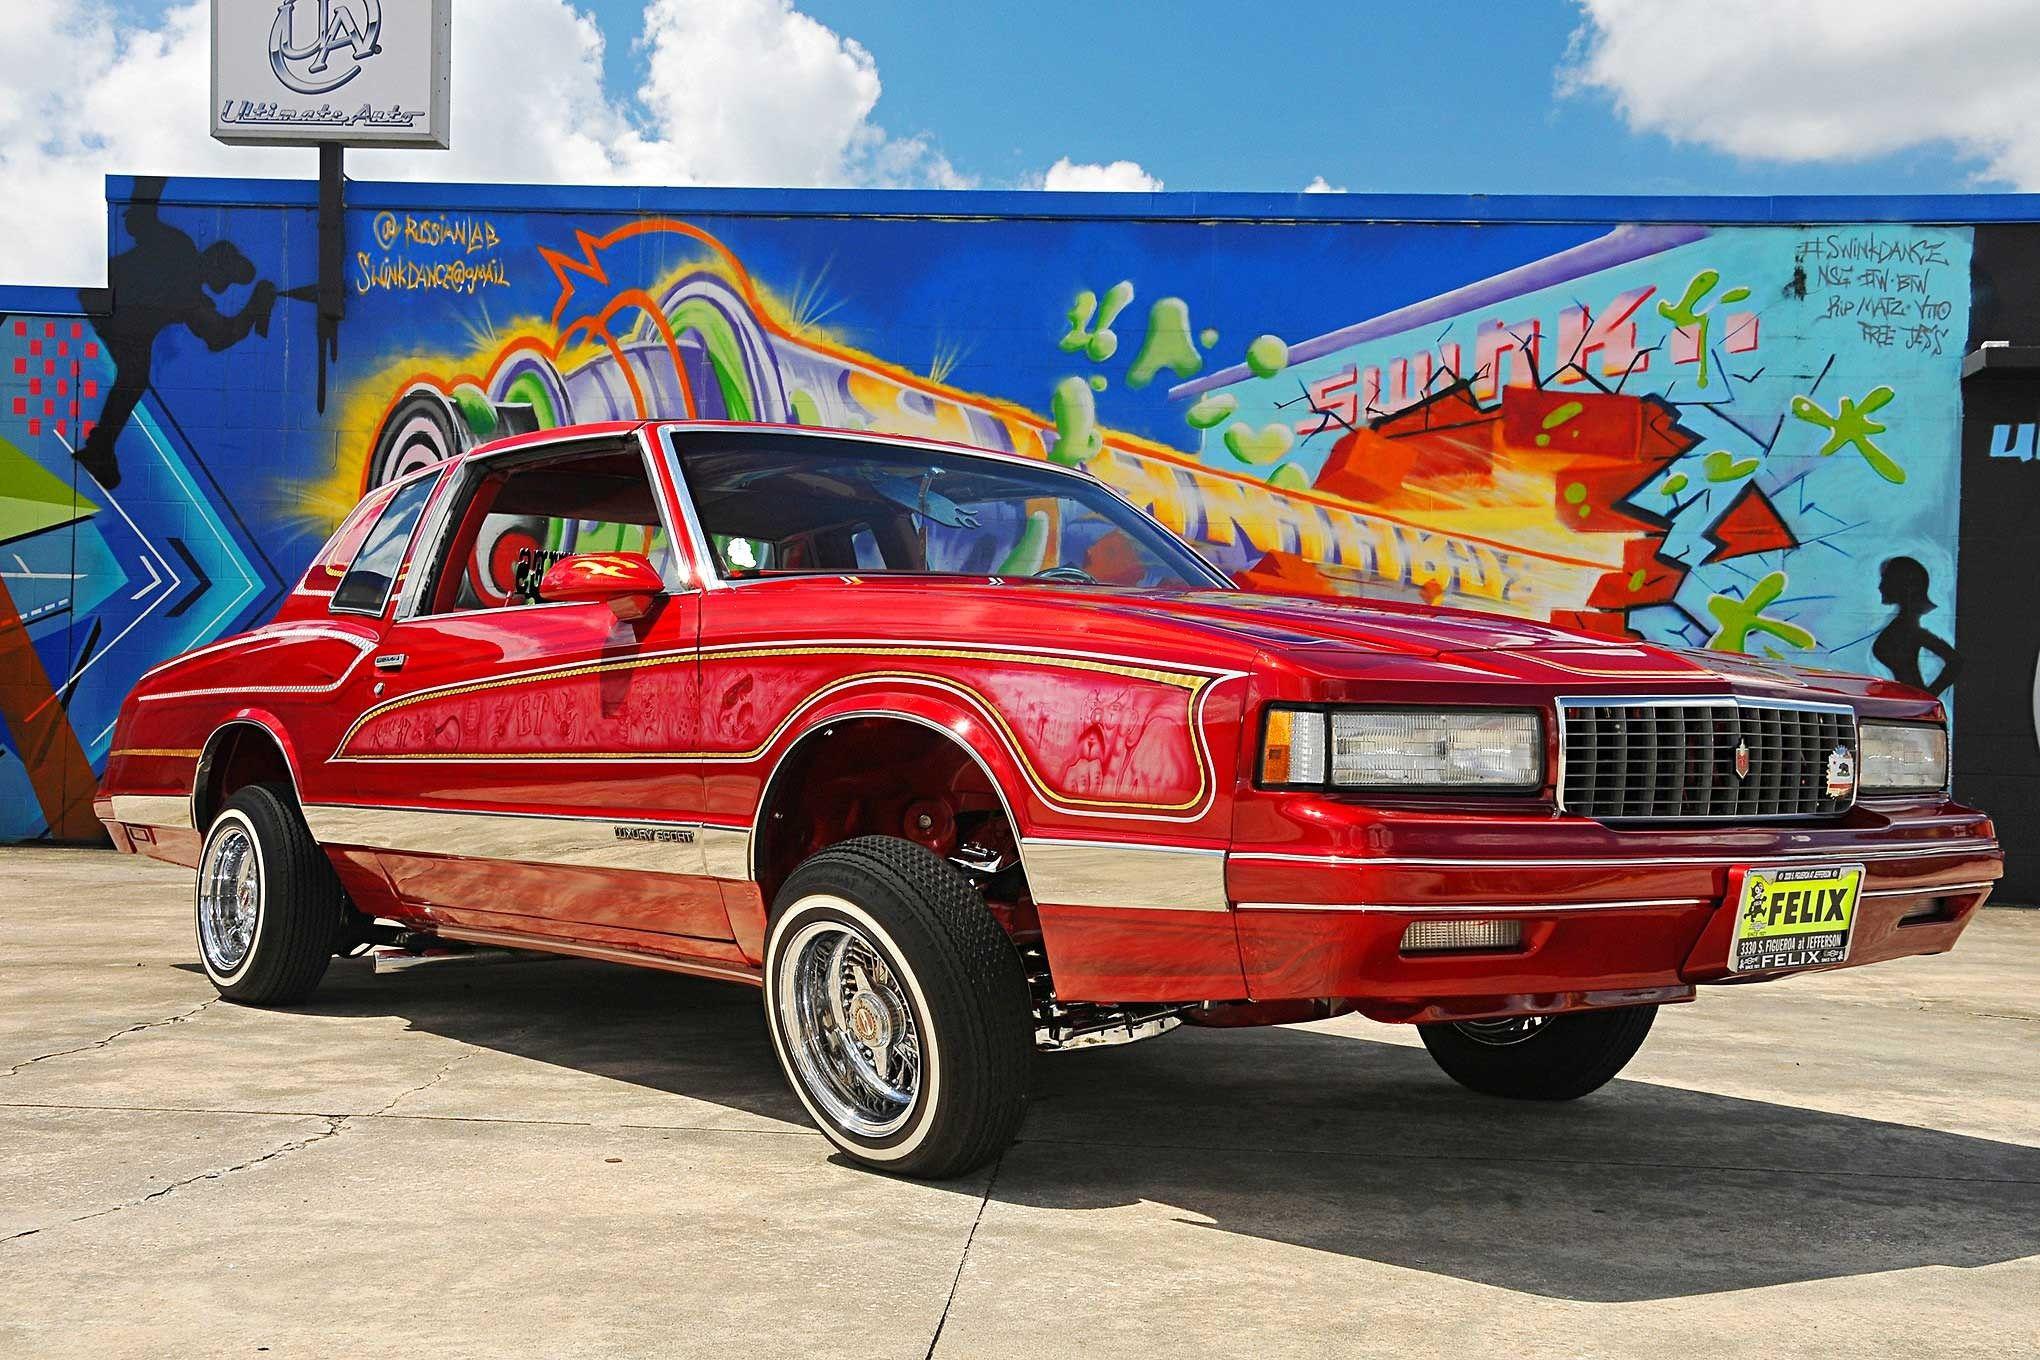 Free Screensaver Chevrolet Monte Carlo Wallpaper 2040x1360 627